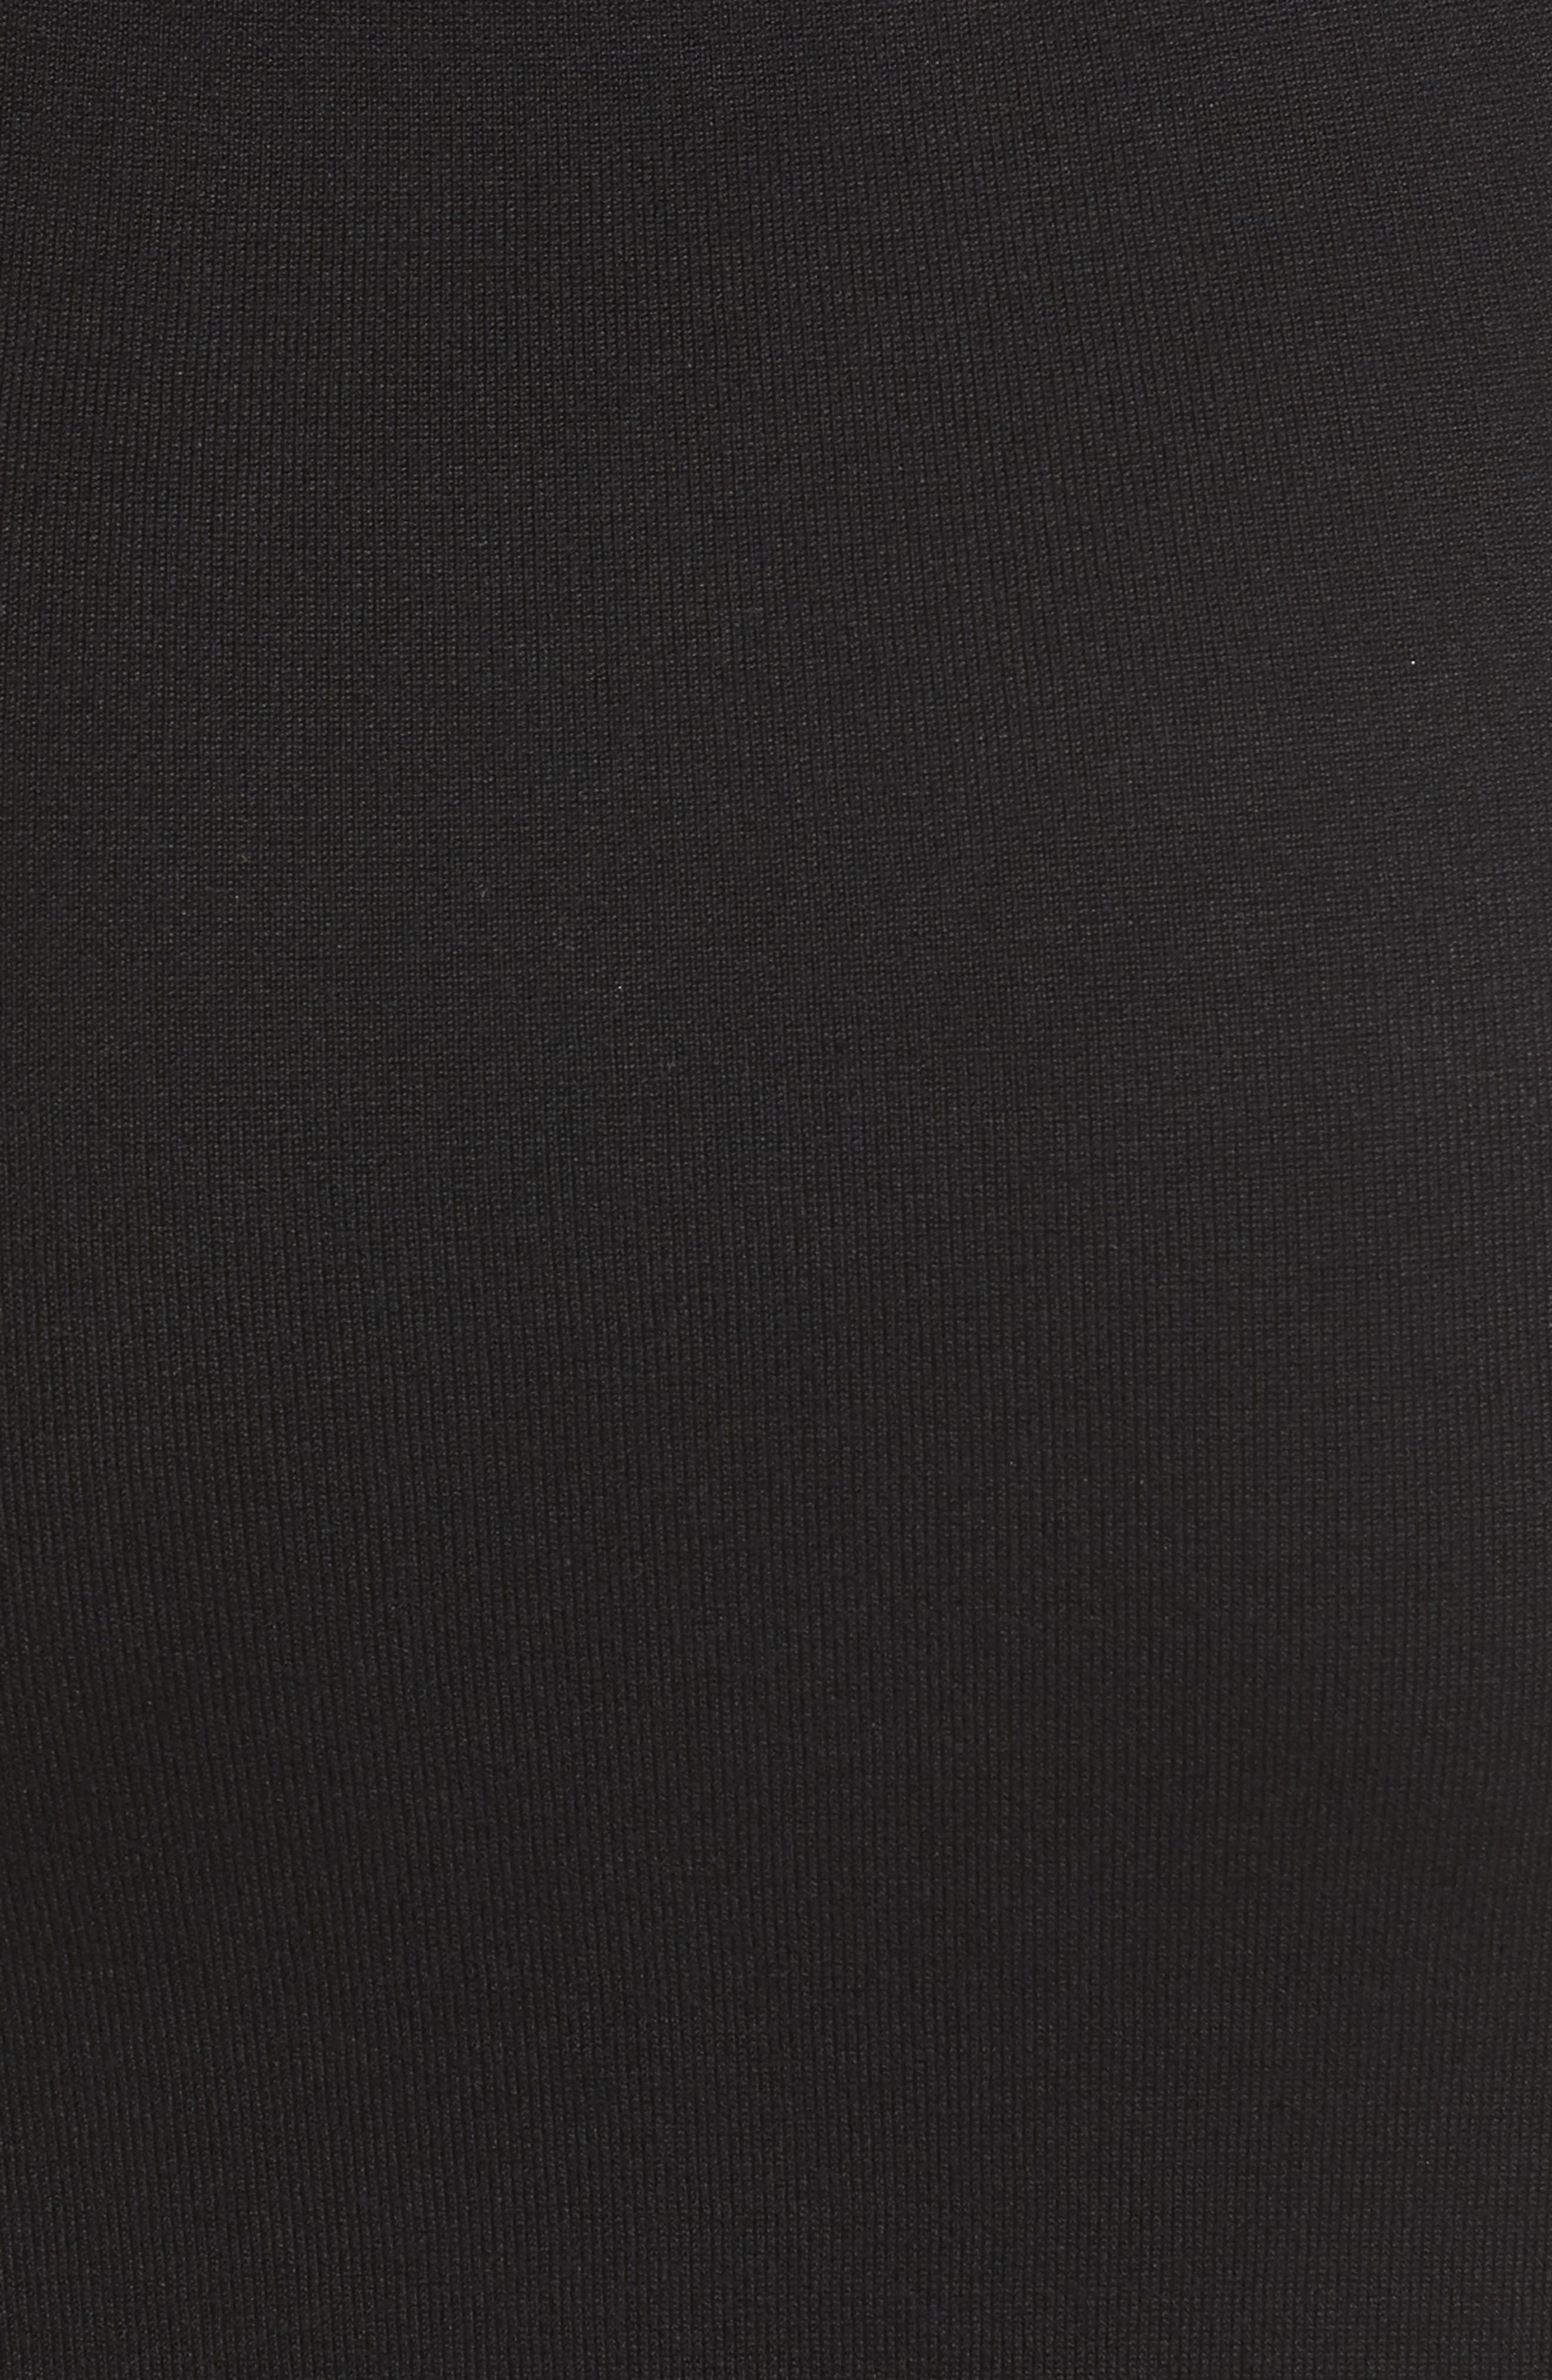 Elbow Sleeve Sweater Dress,                             Alternate thumbnail 5, color,                             001